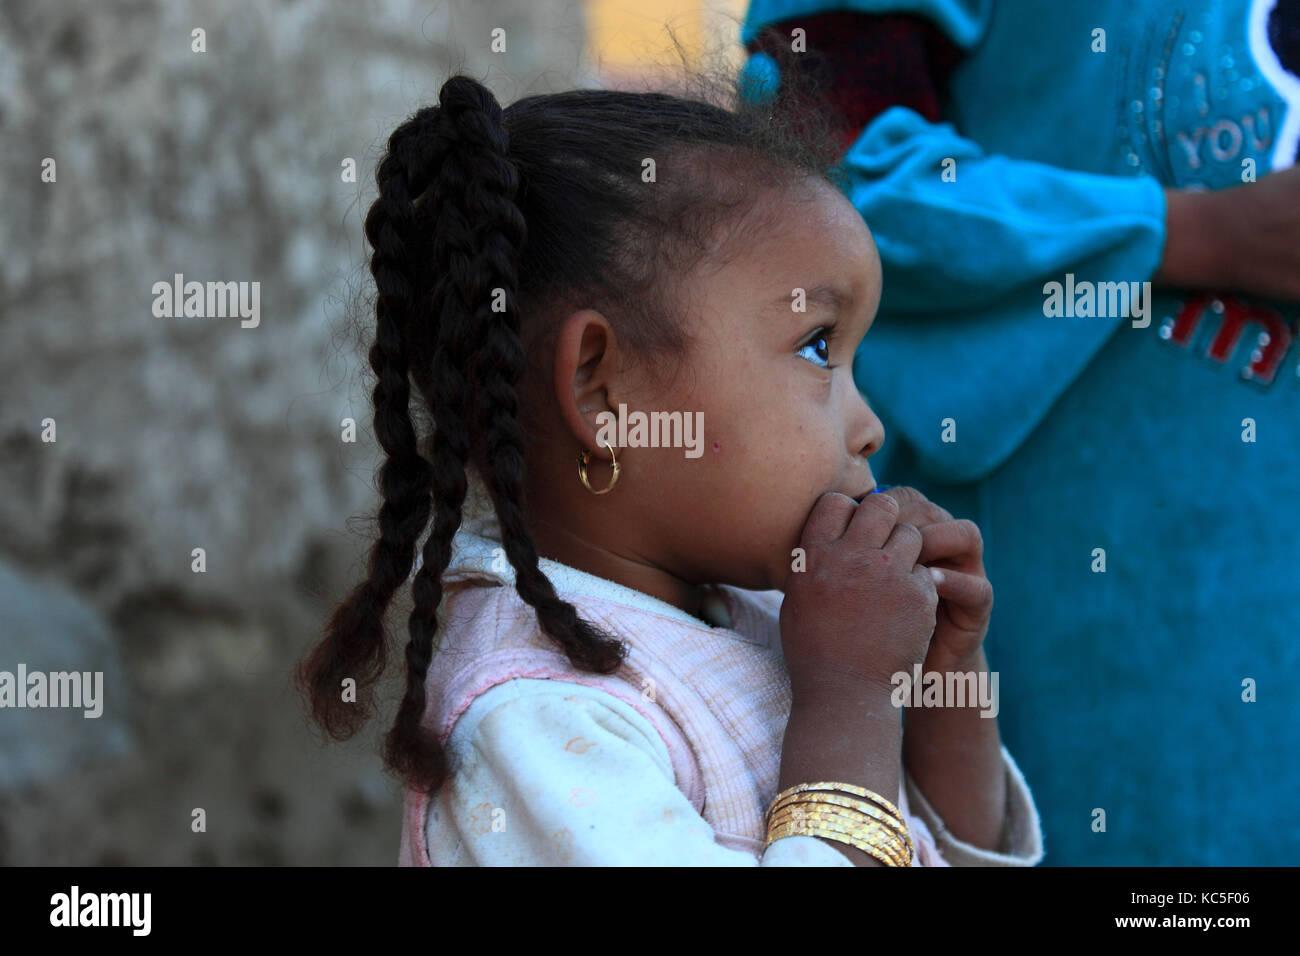 Elephantine Island, Small child with braids, Egypt Stock Photo